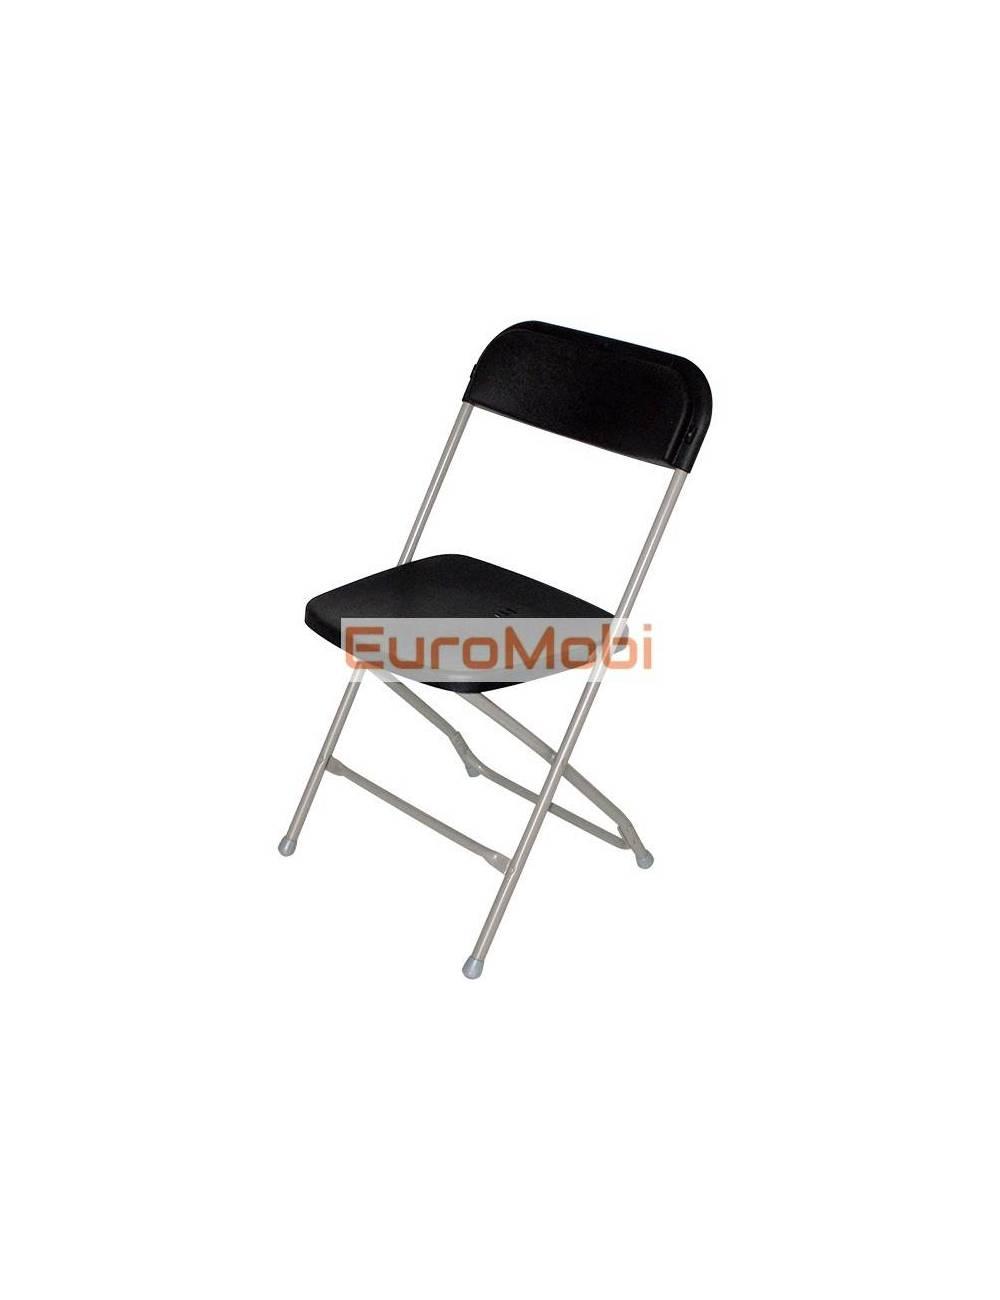 Folding chair Cluny light gray - black